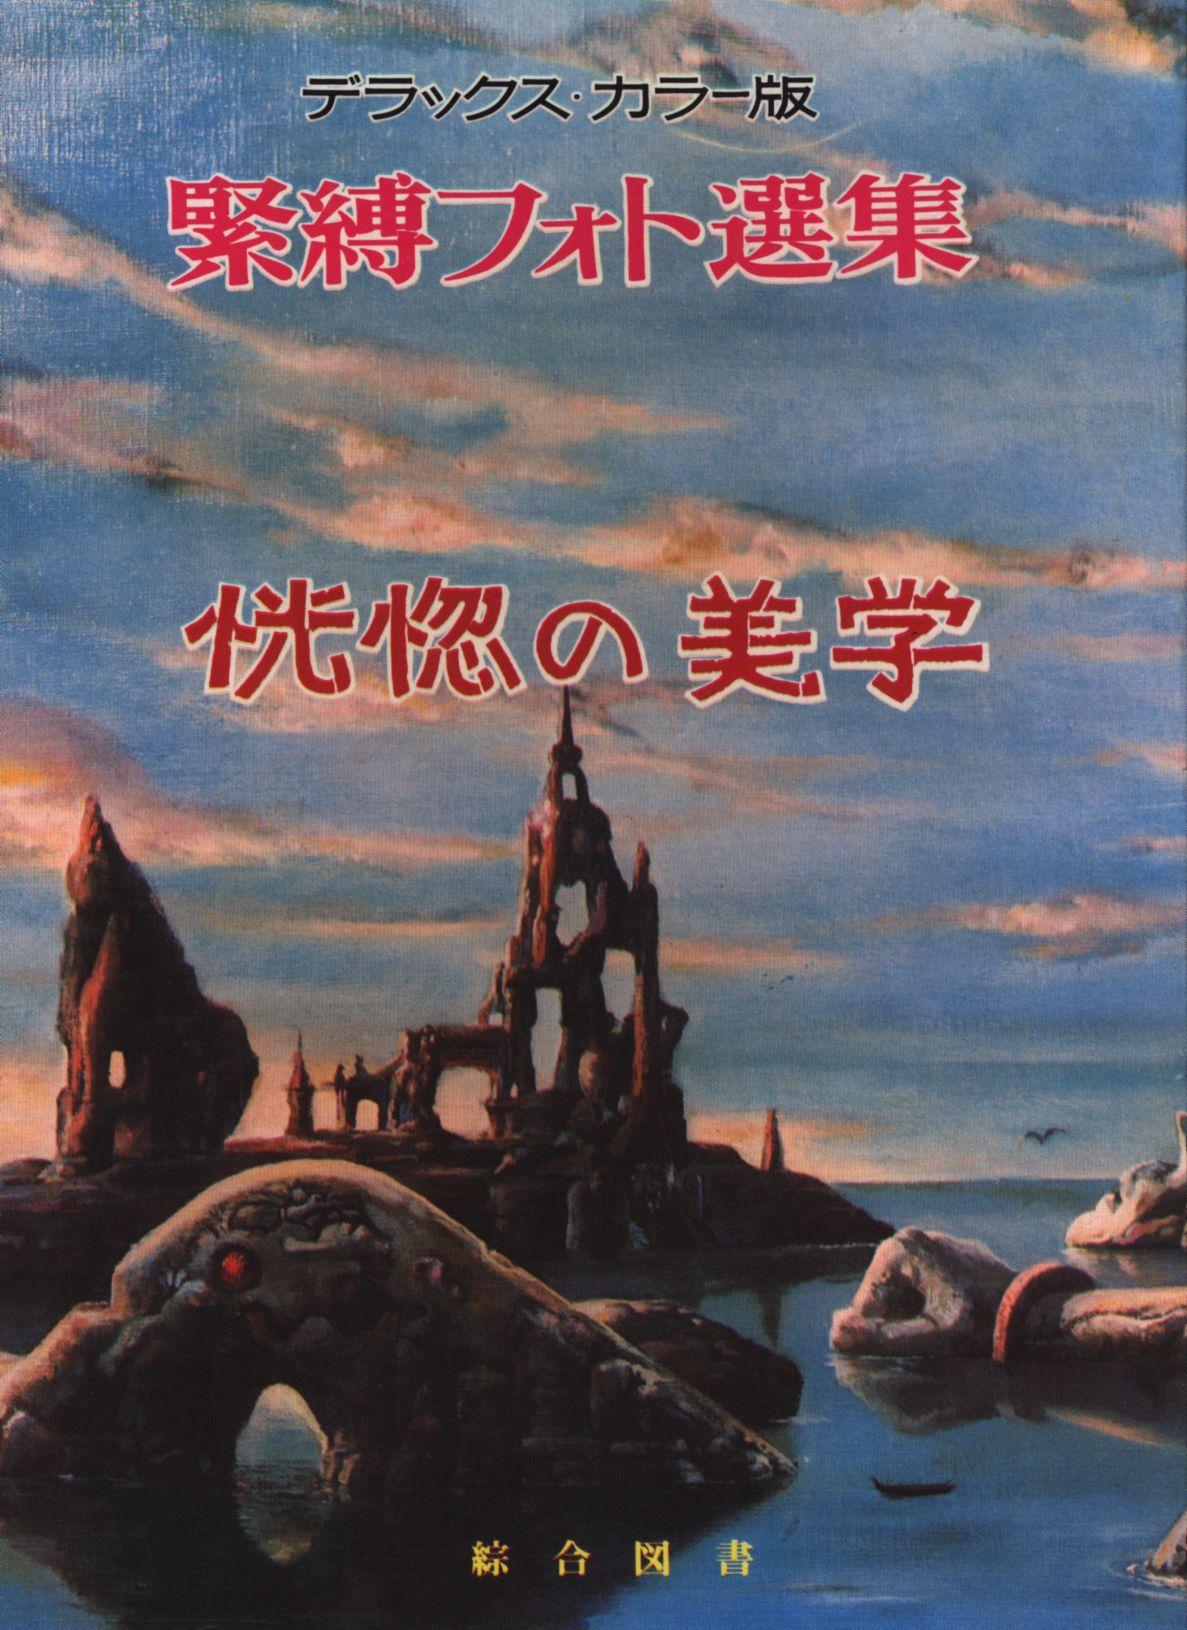 Ran Akiyoshi - Cover Art 02